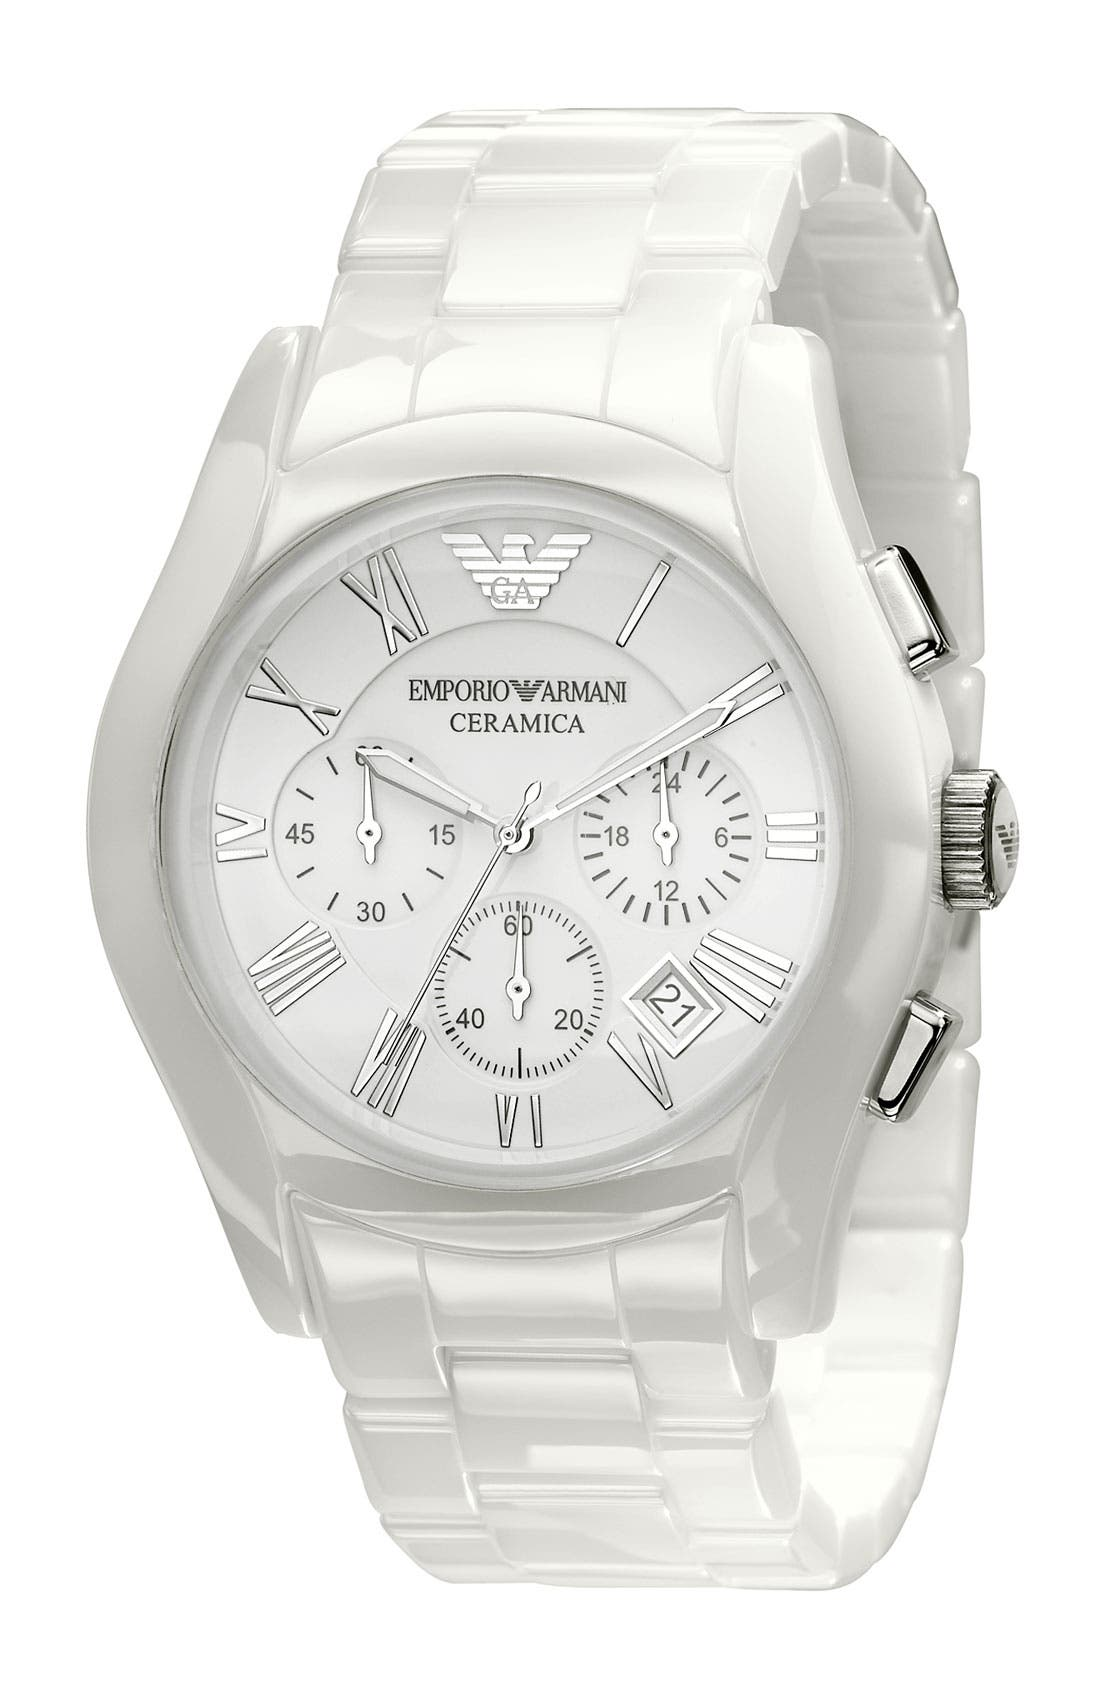 Main Image - Emporio Armani Large Ceramic Chronograph Watch, 42mm